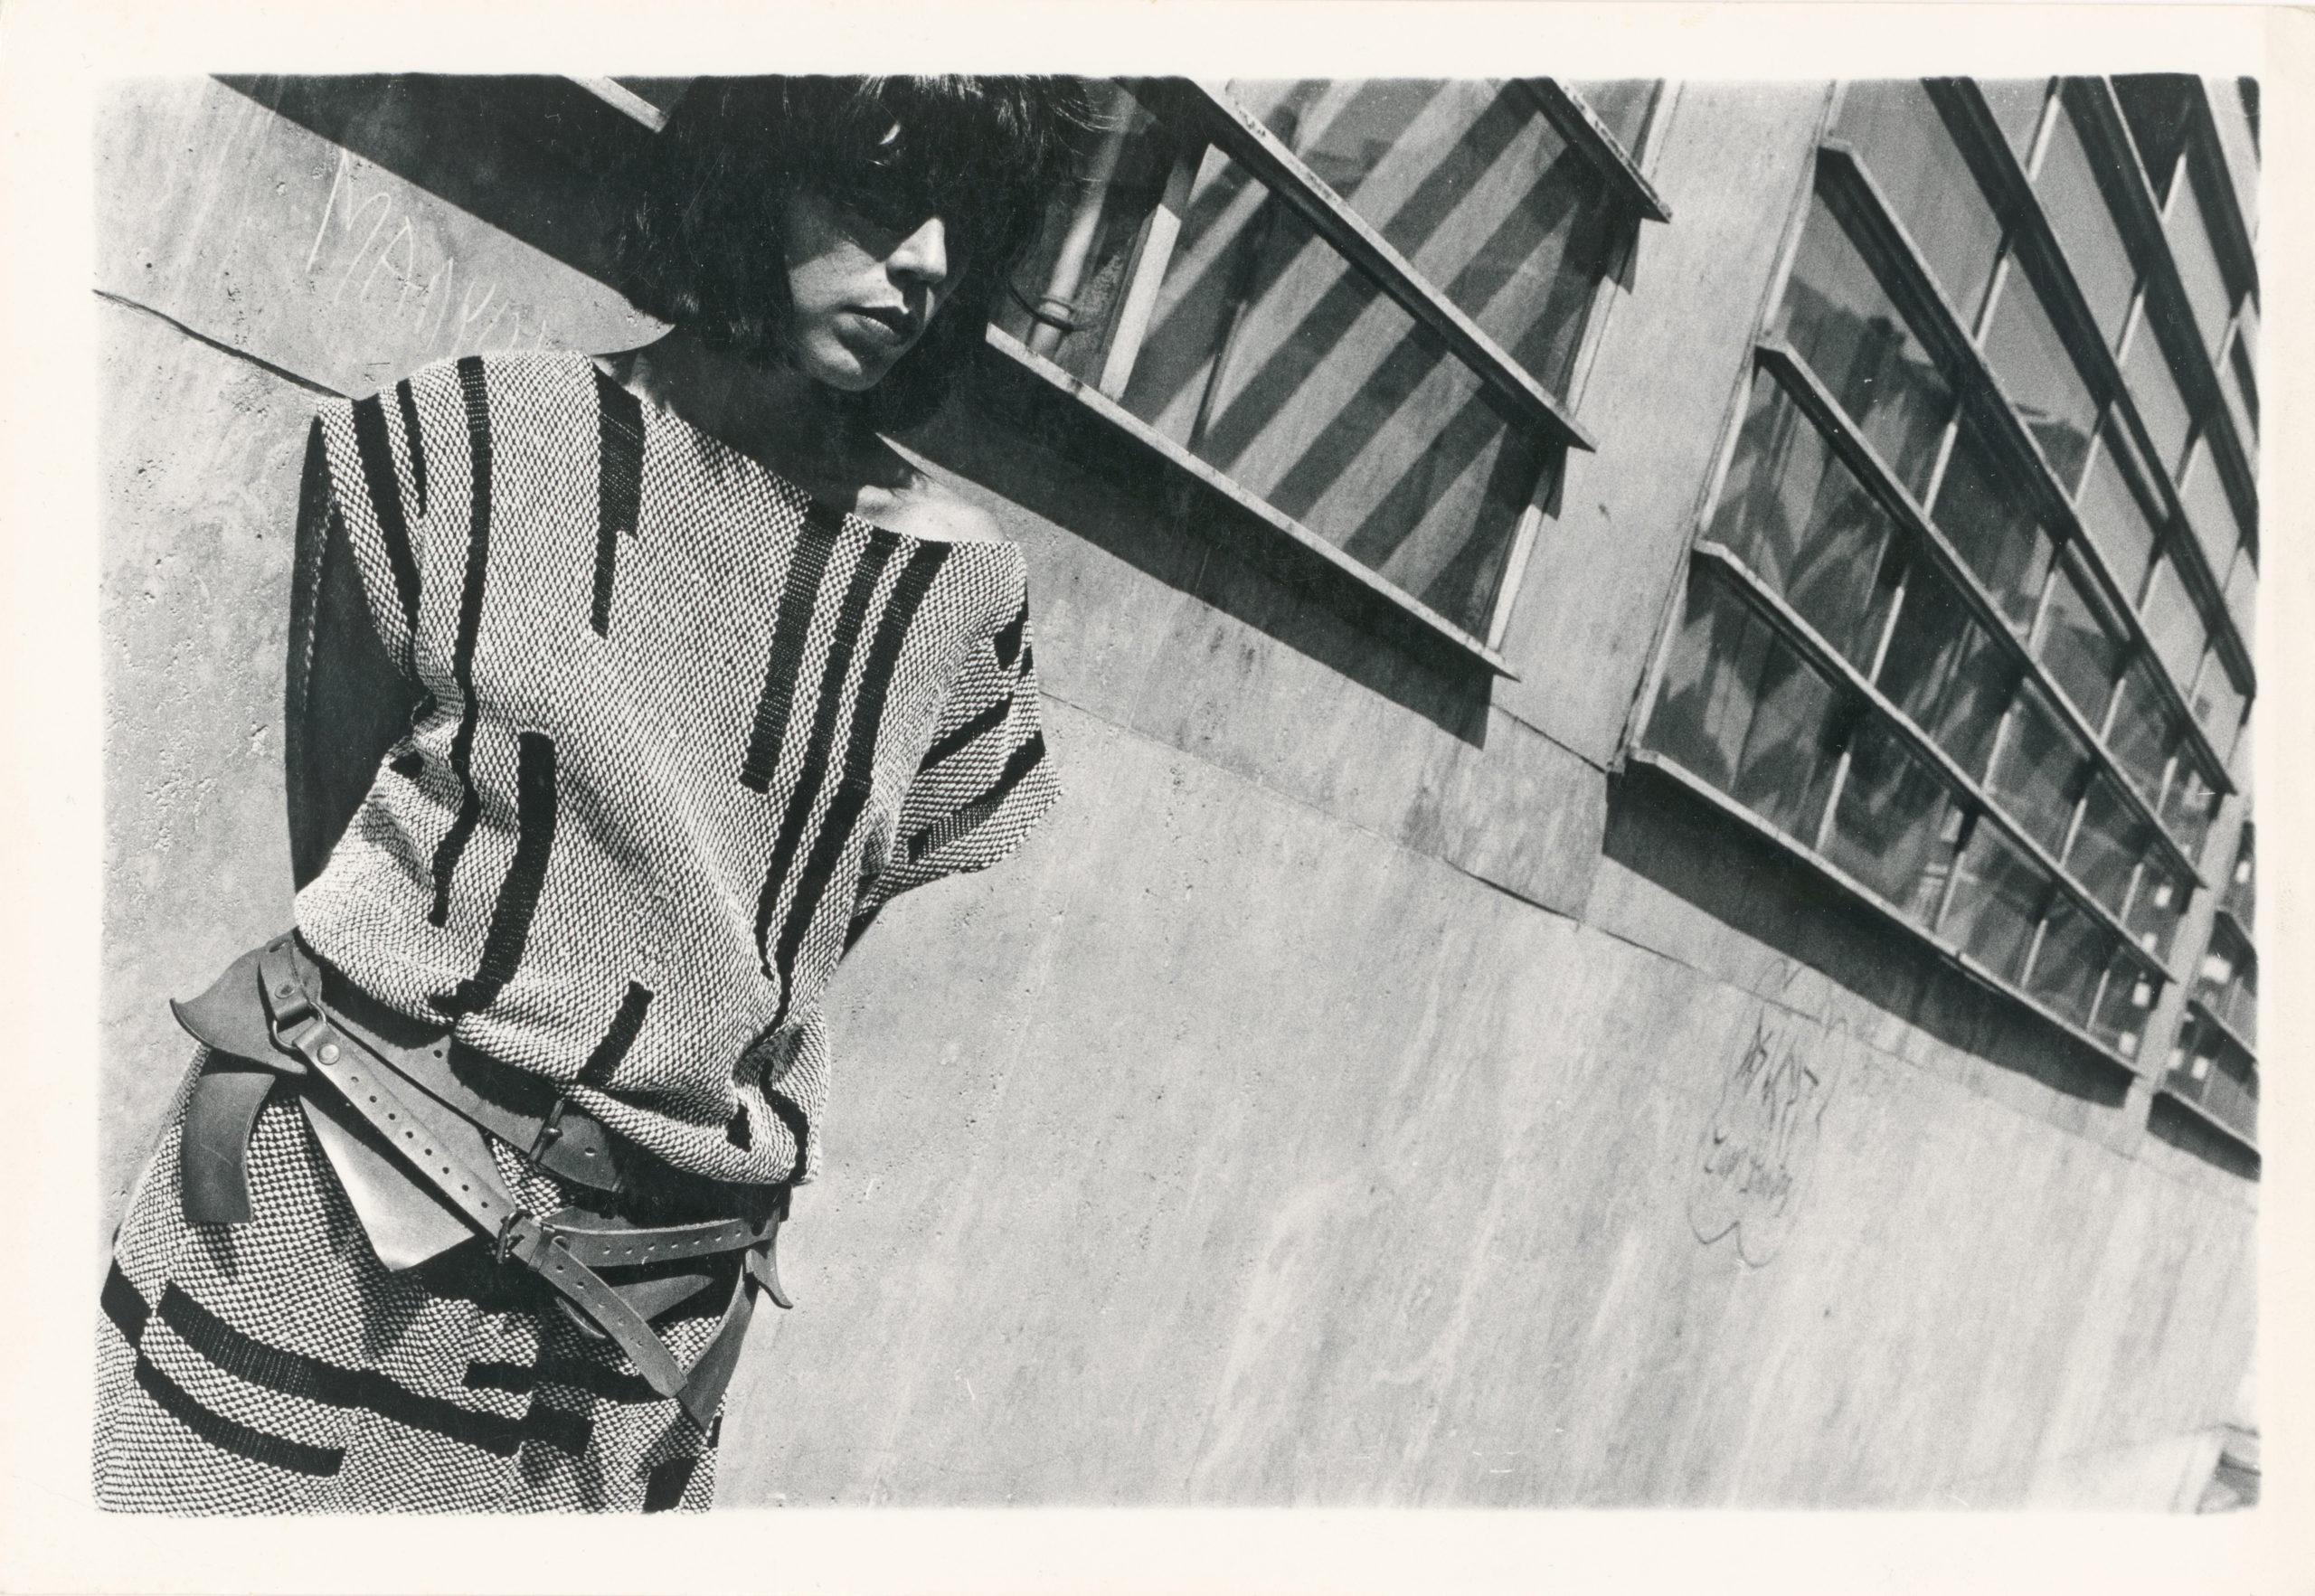 Silke Grossmann, Bild für Claudia Skoda, in Zusammenarbeit mit Cynthia Beatt, 1983. Foto: Silke Grossmann/SMB/Kunstbibliothek/Dietmar Katz